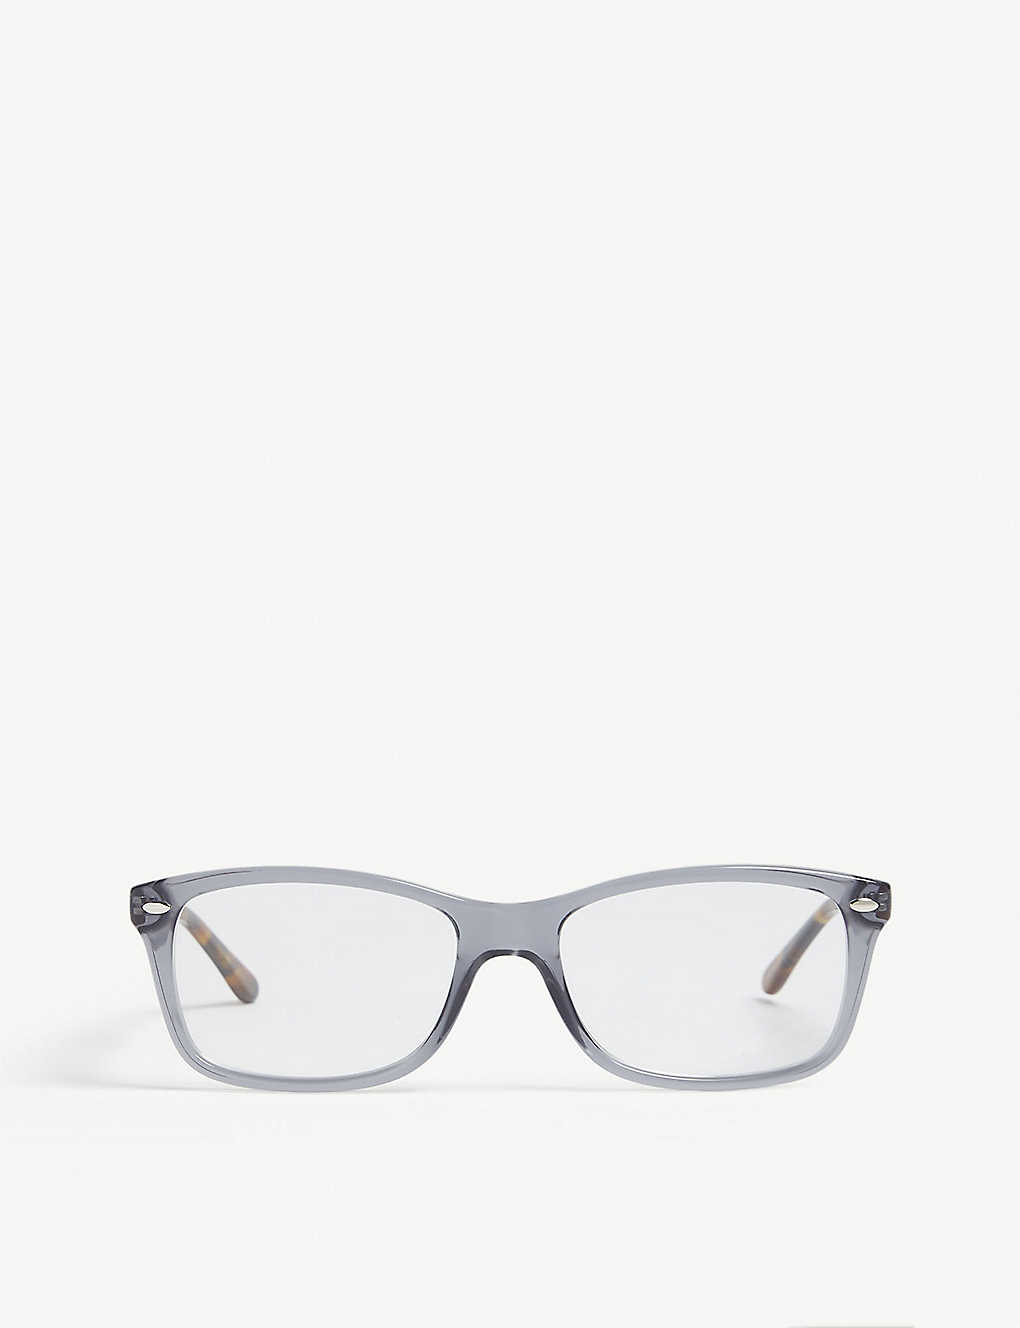 e40e20f4b8c RAY-BAN - RB5228 square-frame glasses